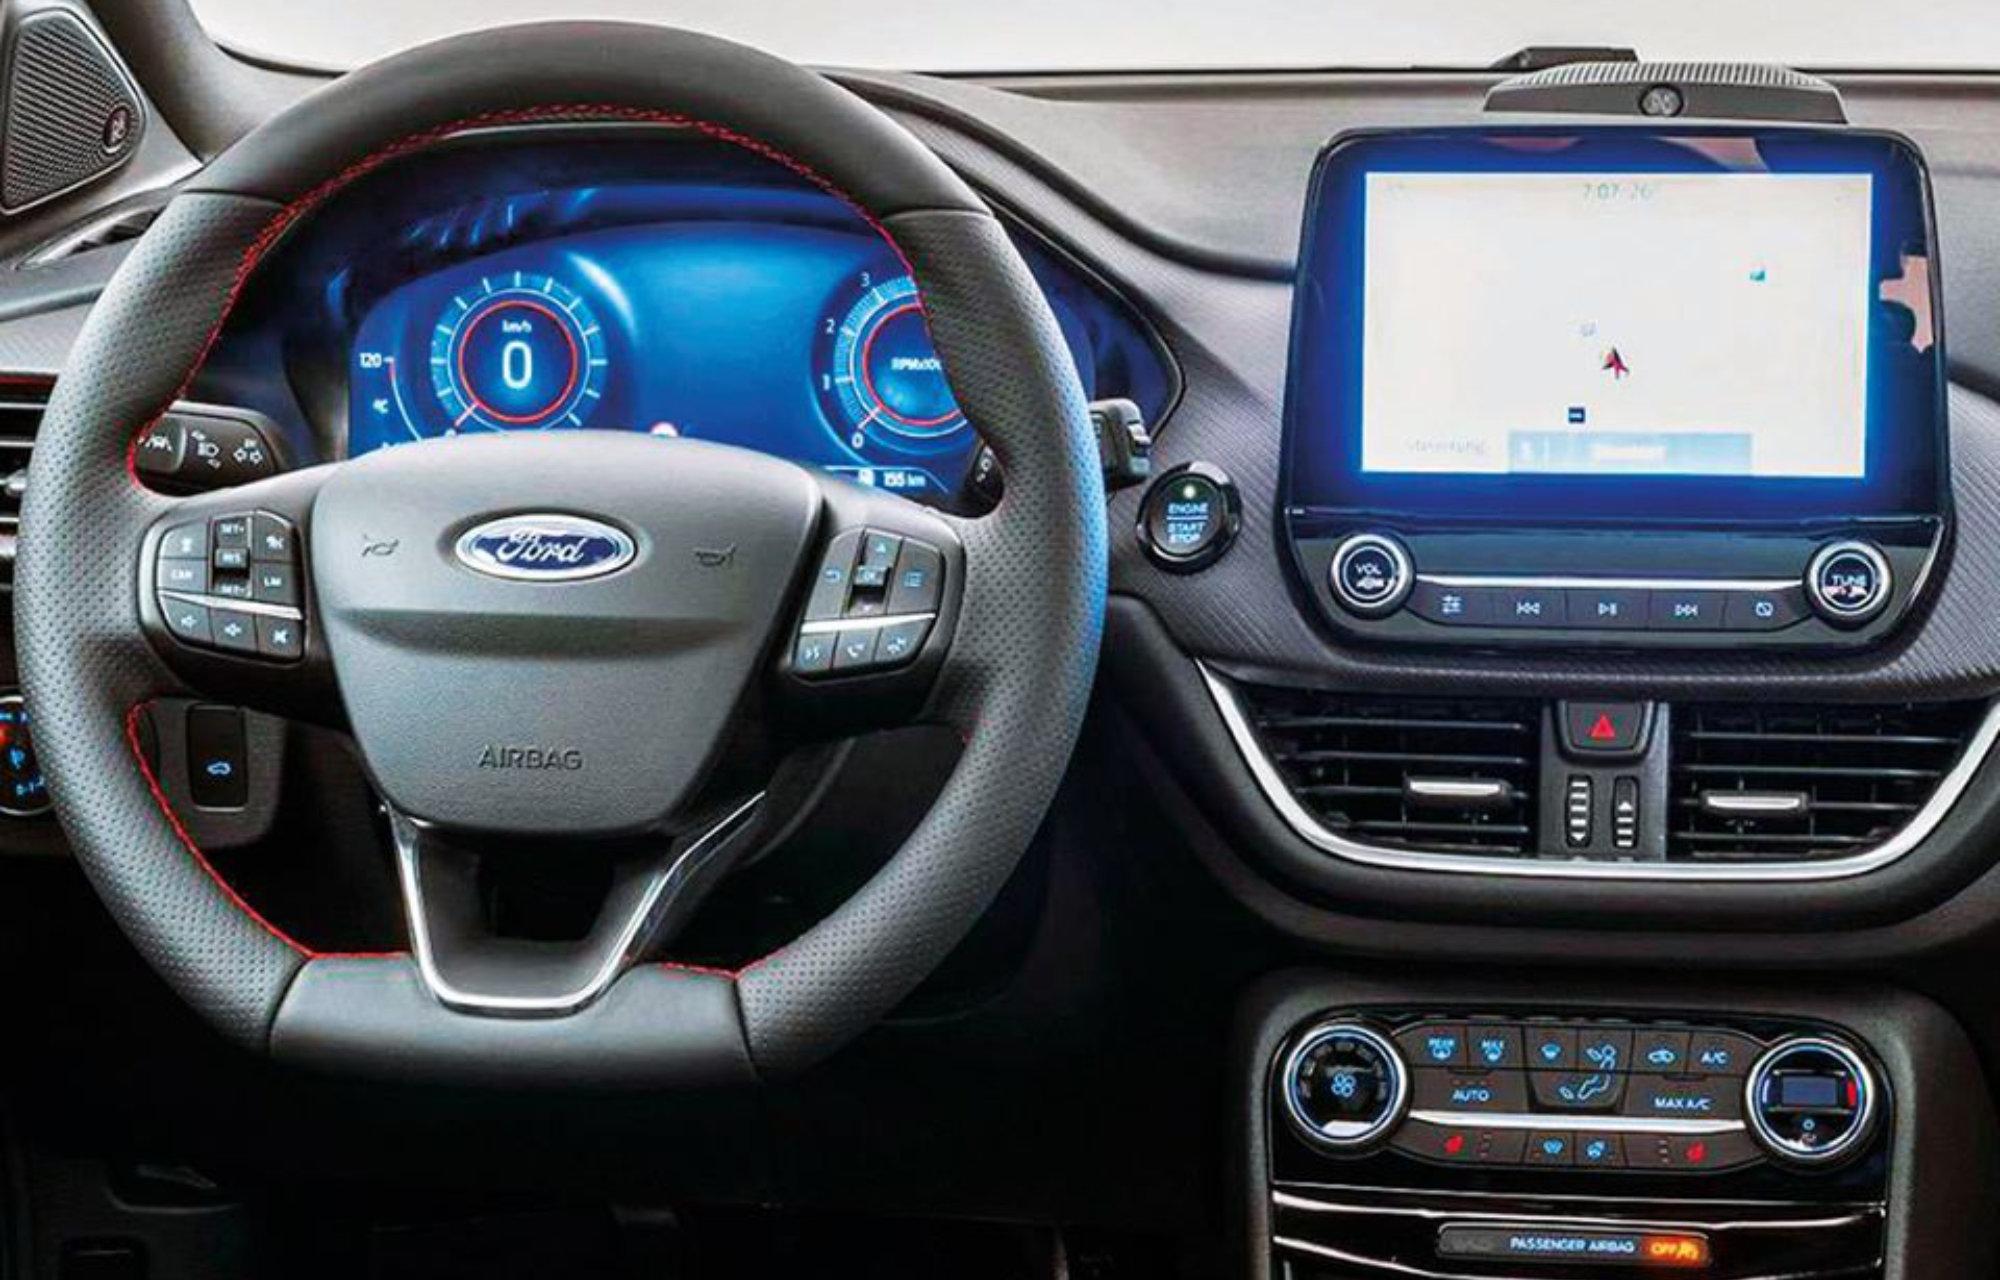 Ford Puma Vanspringel Automobiles